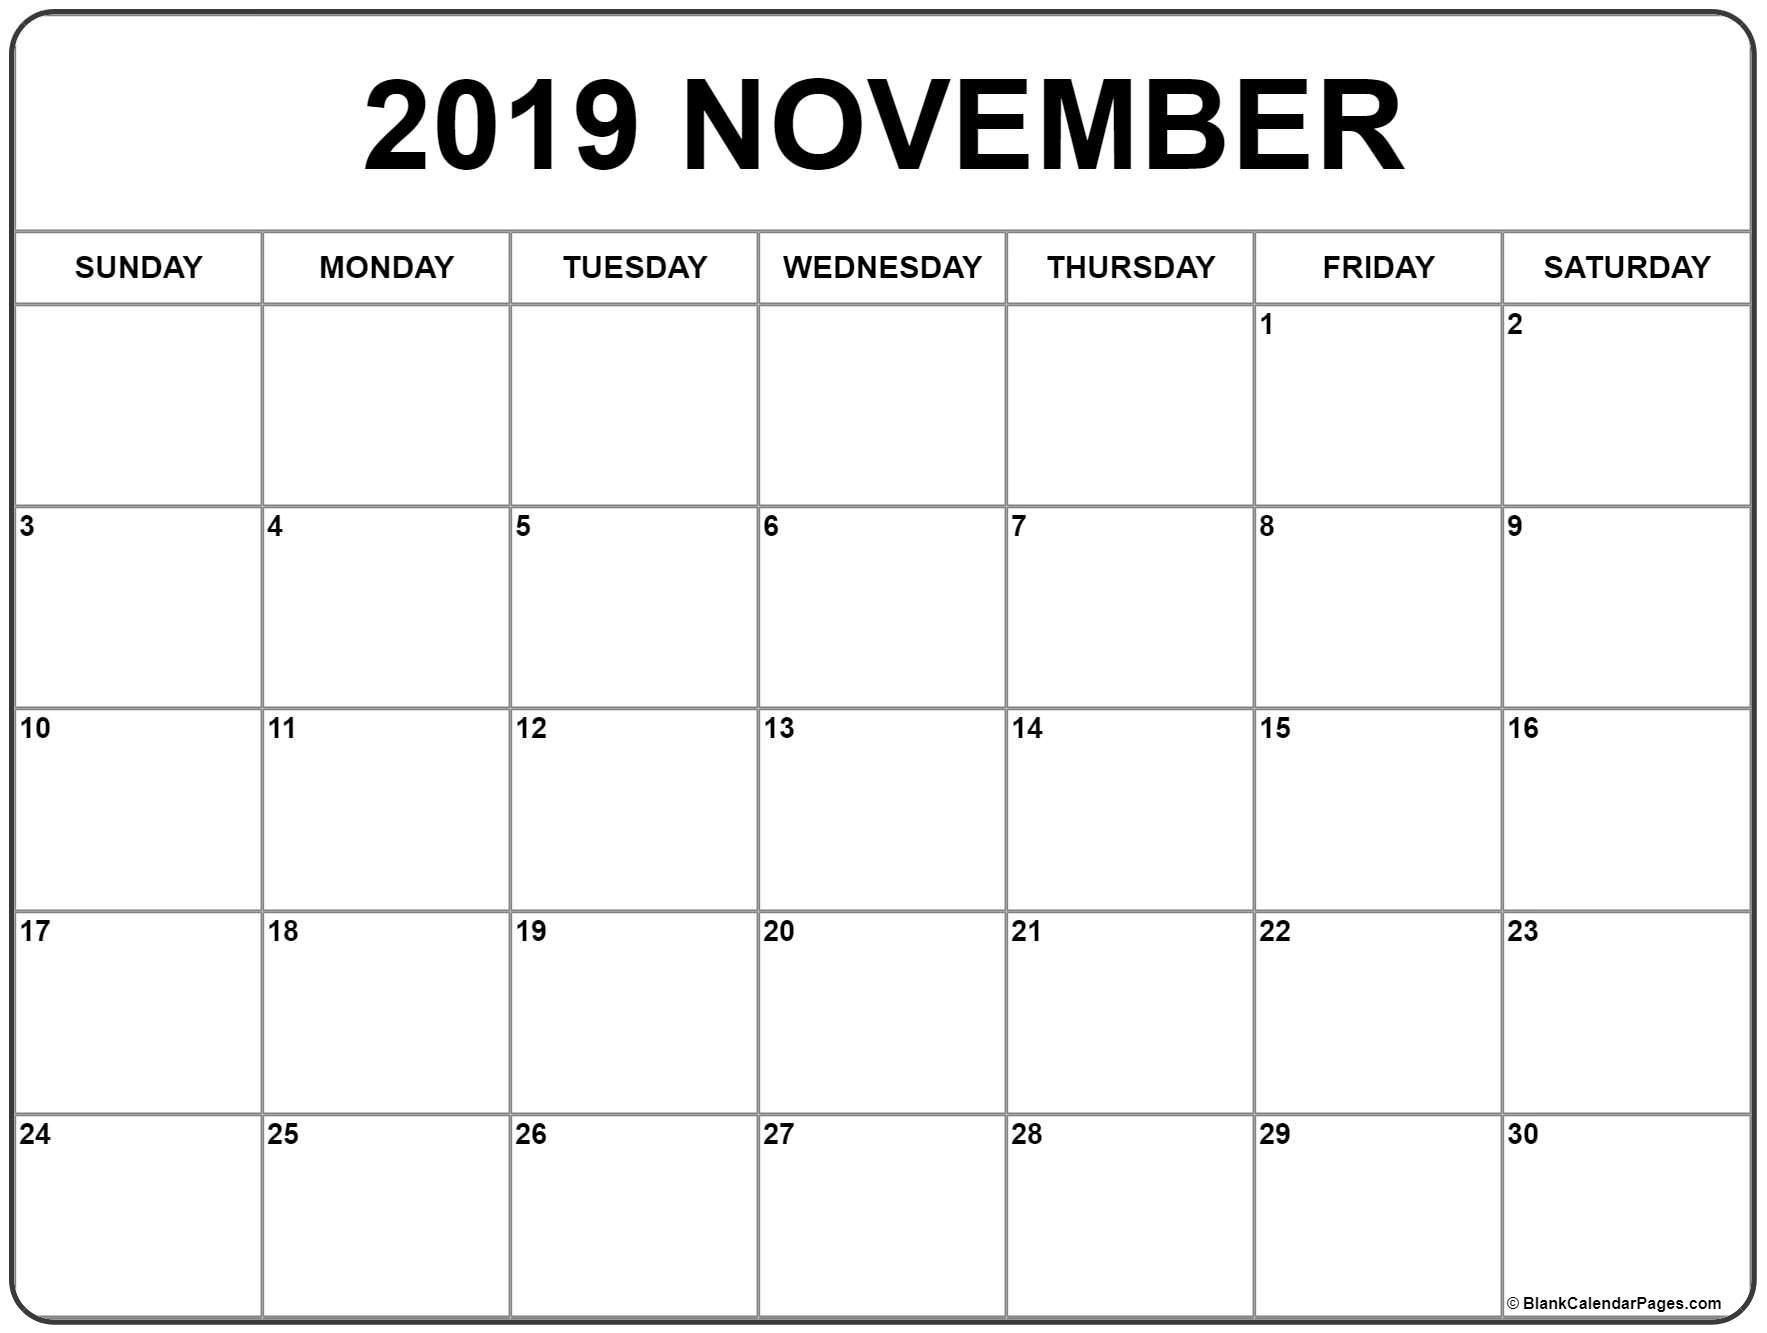 November 2019 Calendar In 2019 | January Calendar, Blank